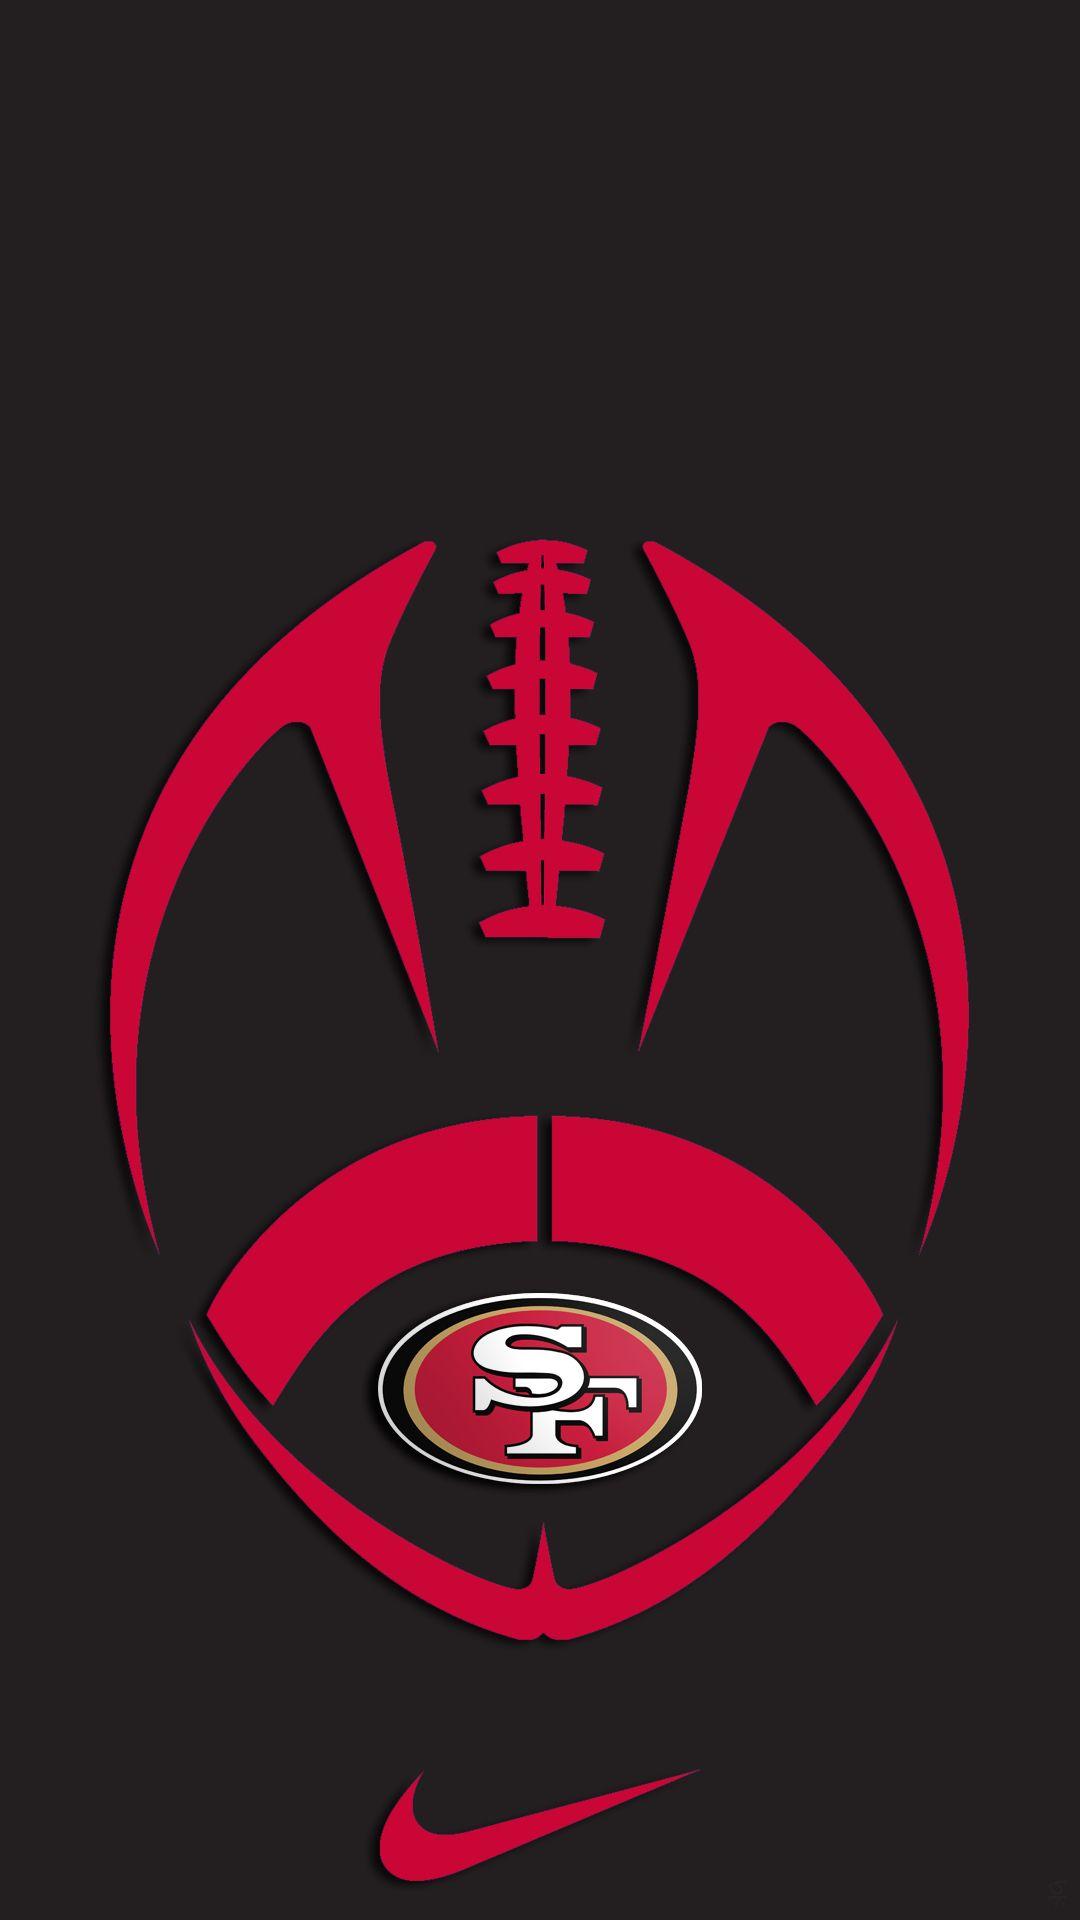 Pin By Jennifer Bubp Reid On 49ers San Francisco 49ers Logo Atlanta Falcons Wallpaper San Francisco 49ers